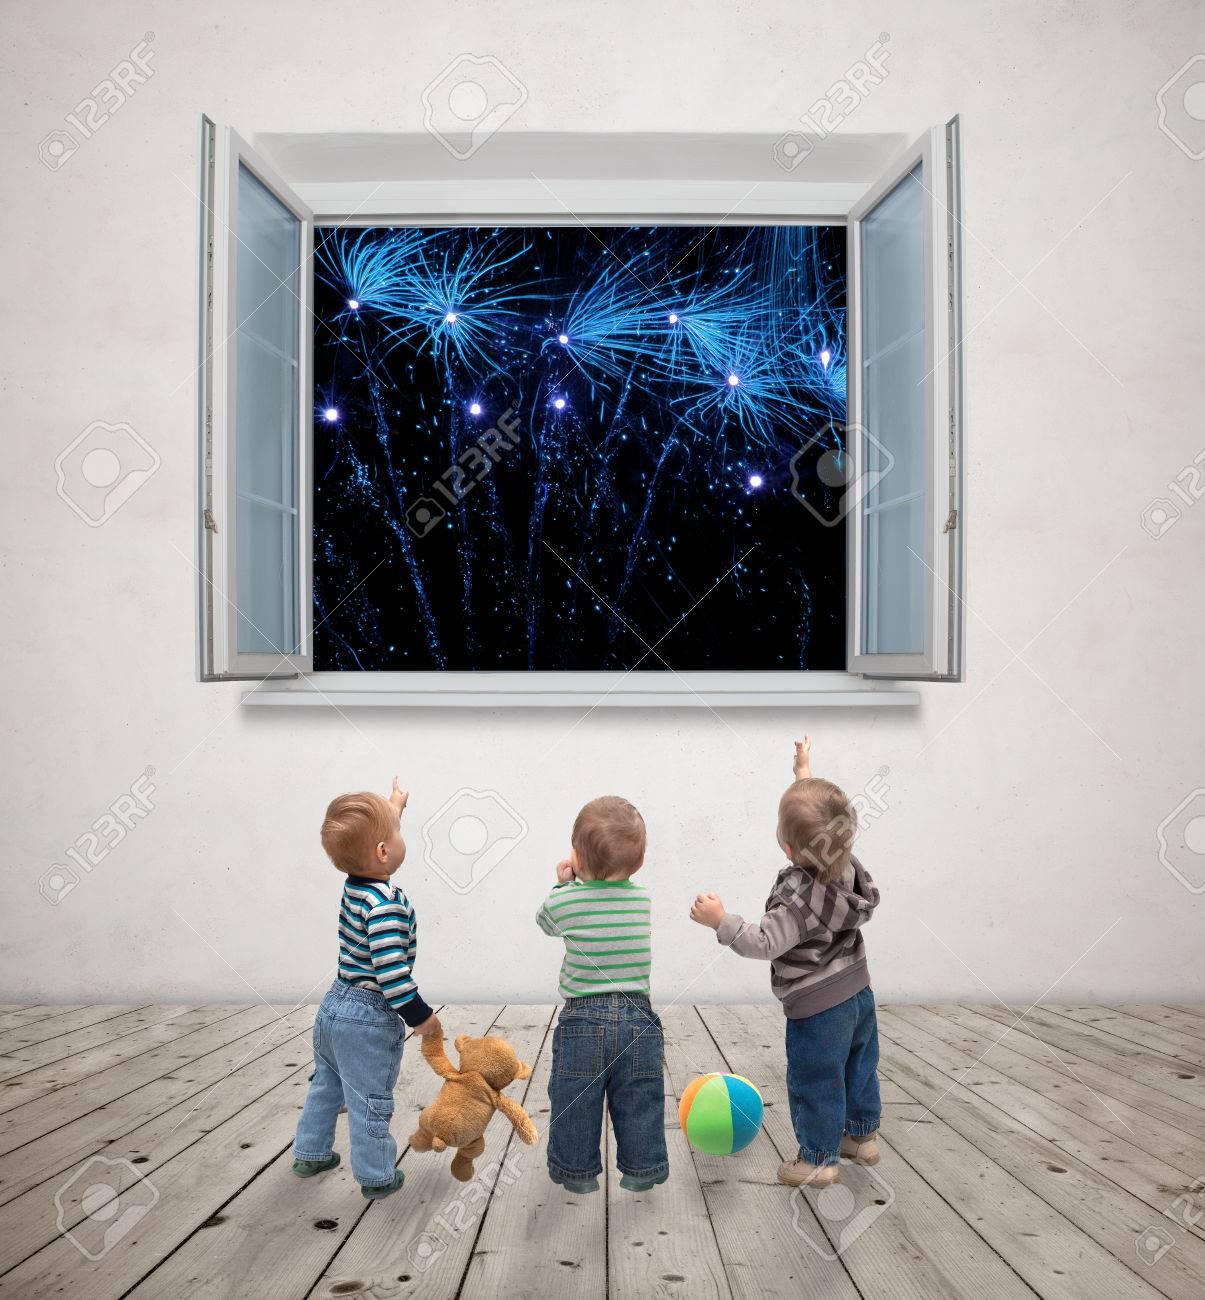 little kids watching fireworks Stock Photo - 27490652